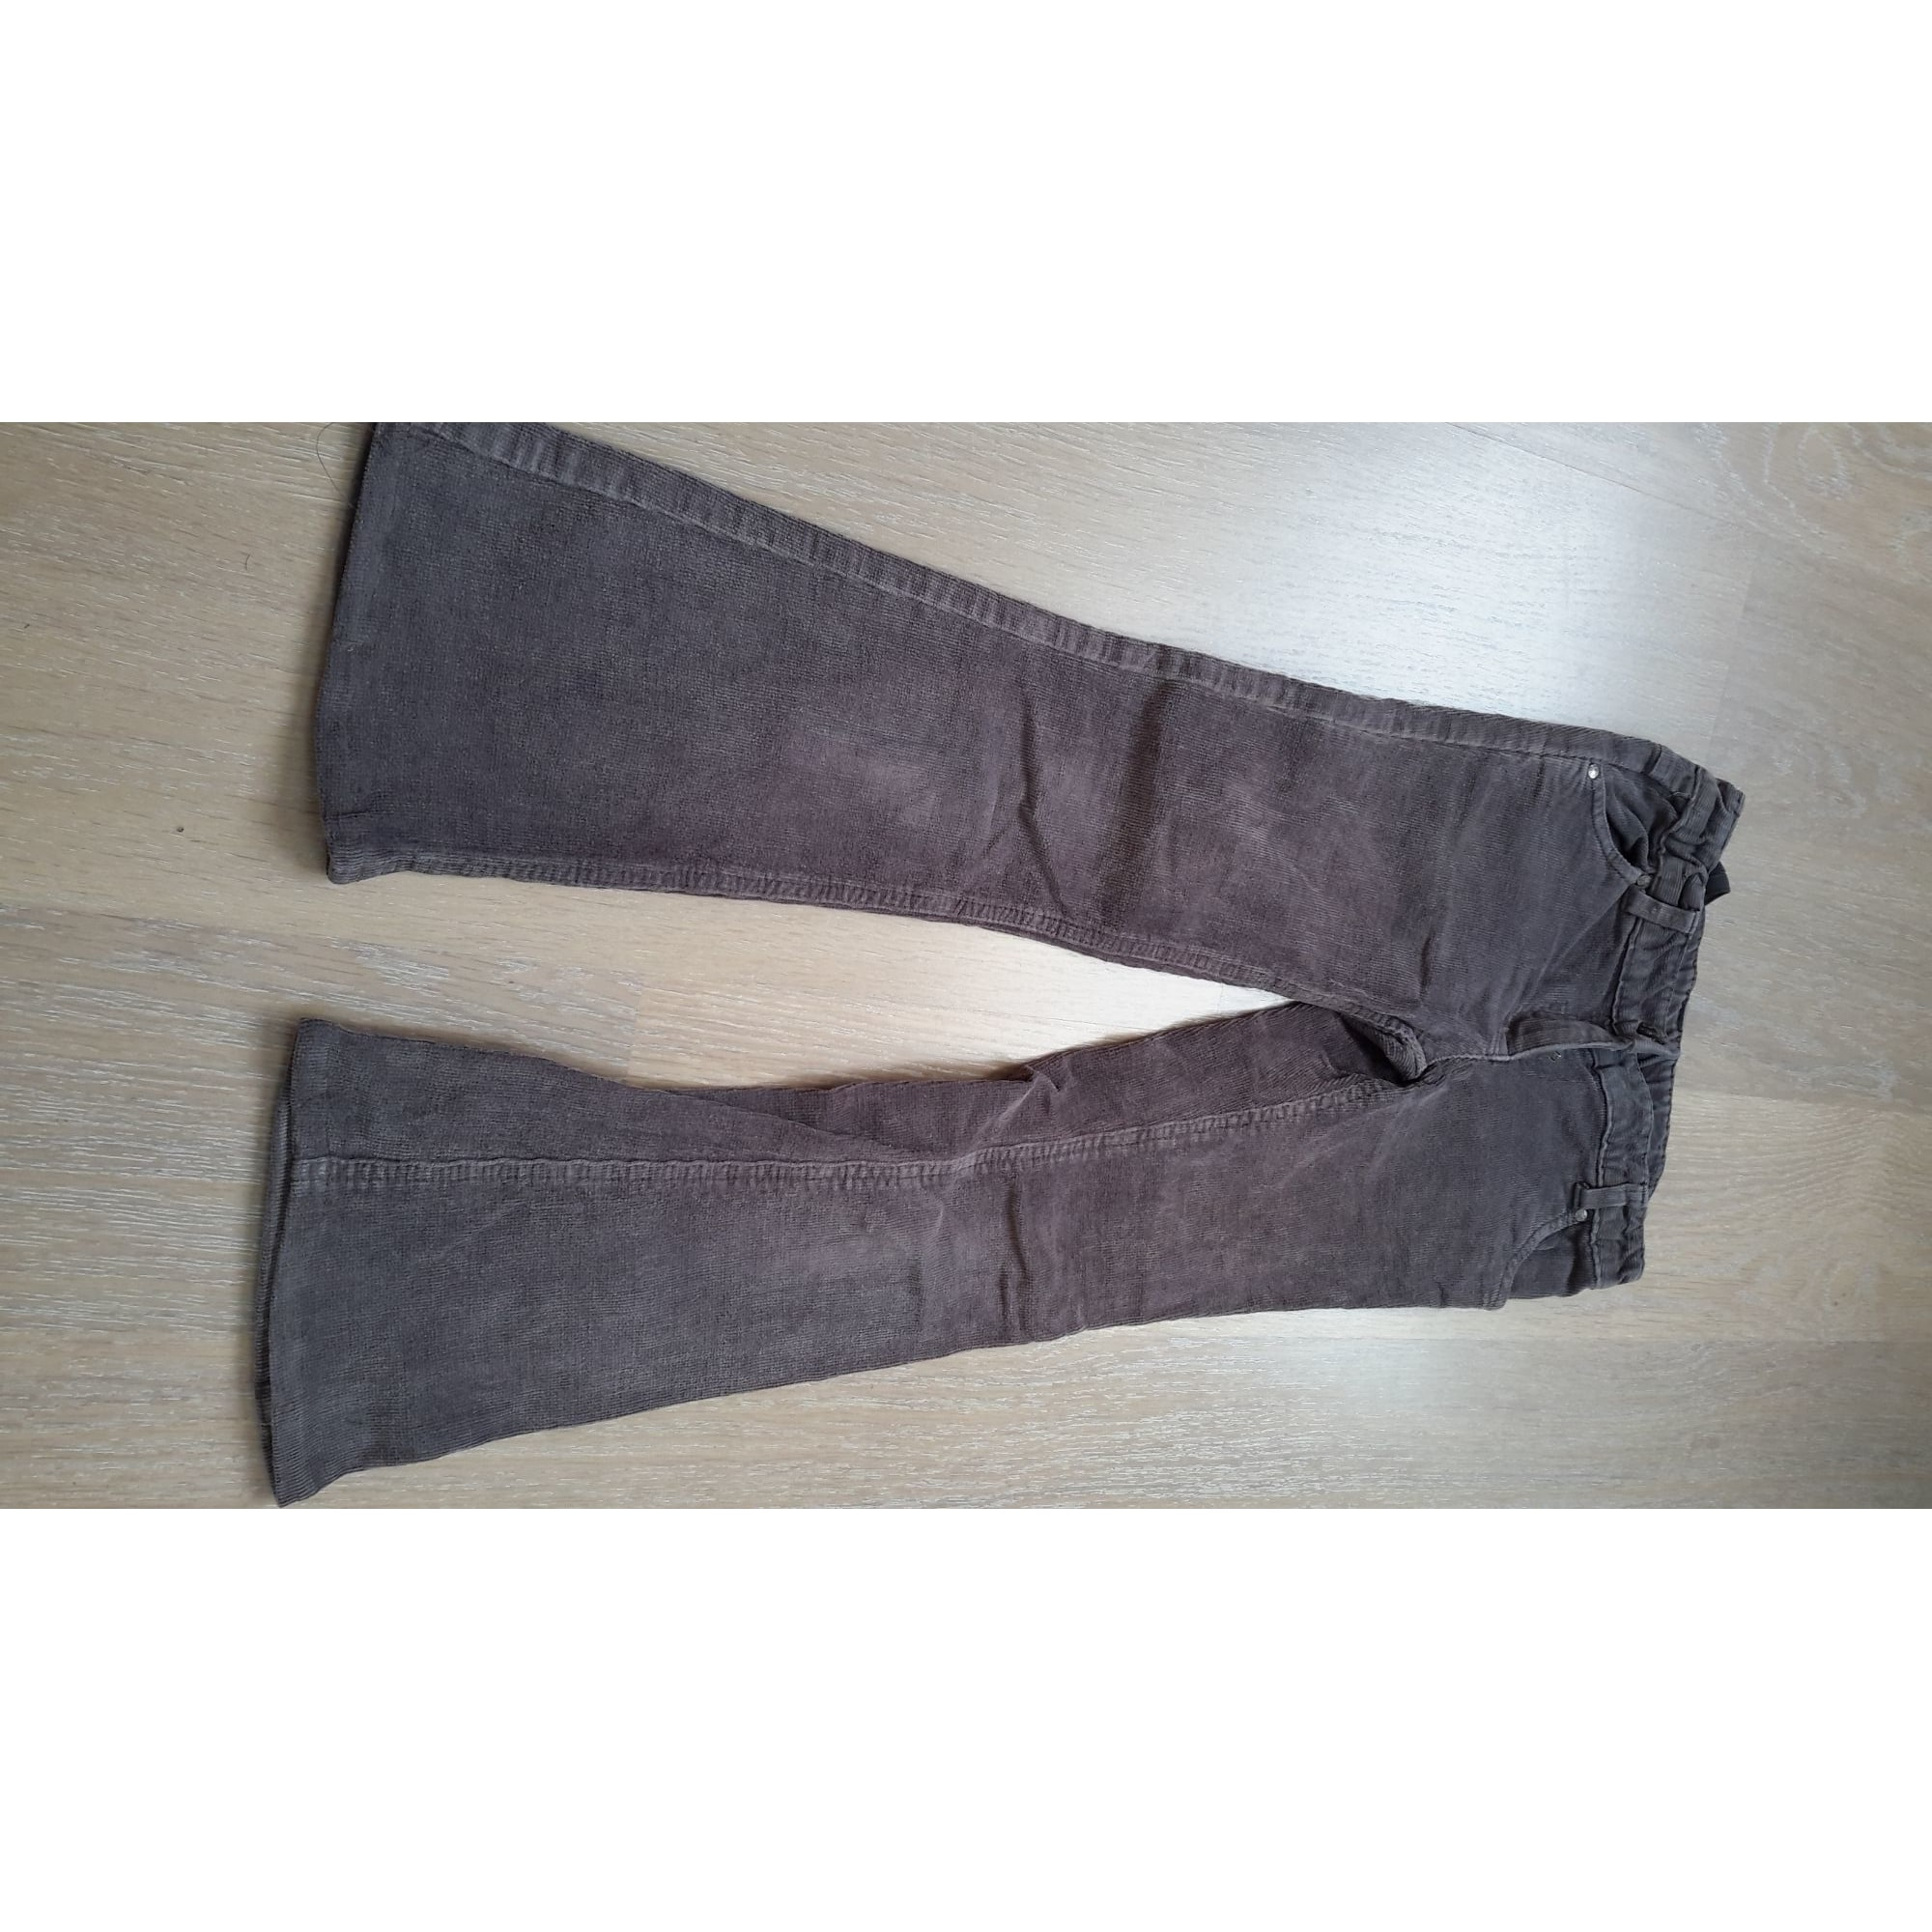 Pantalon NKY Gris, anthracite